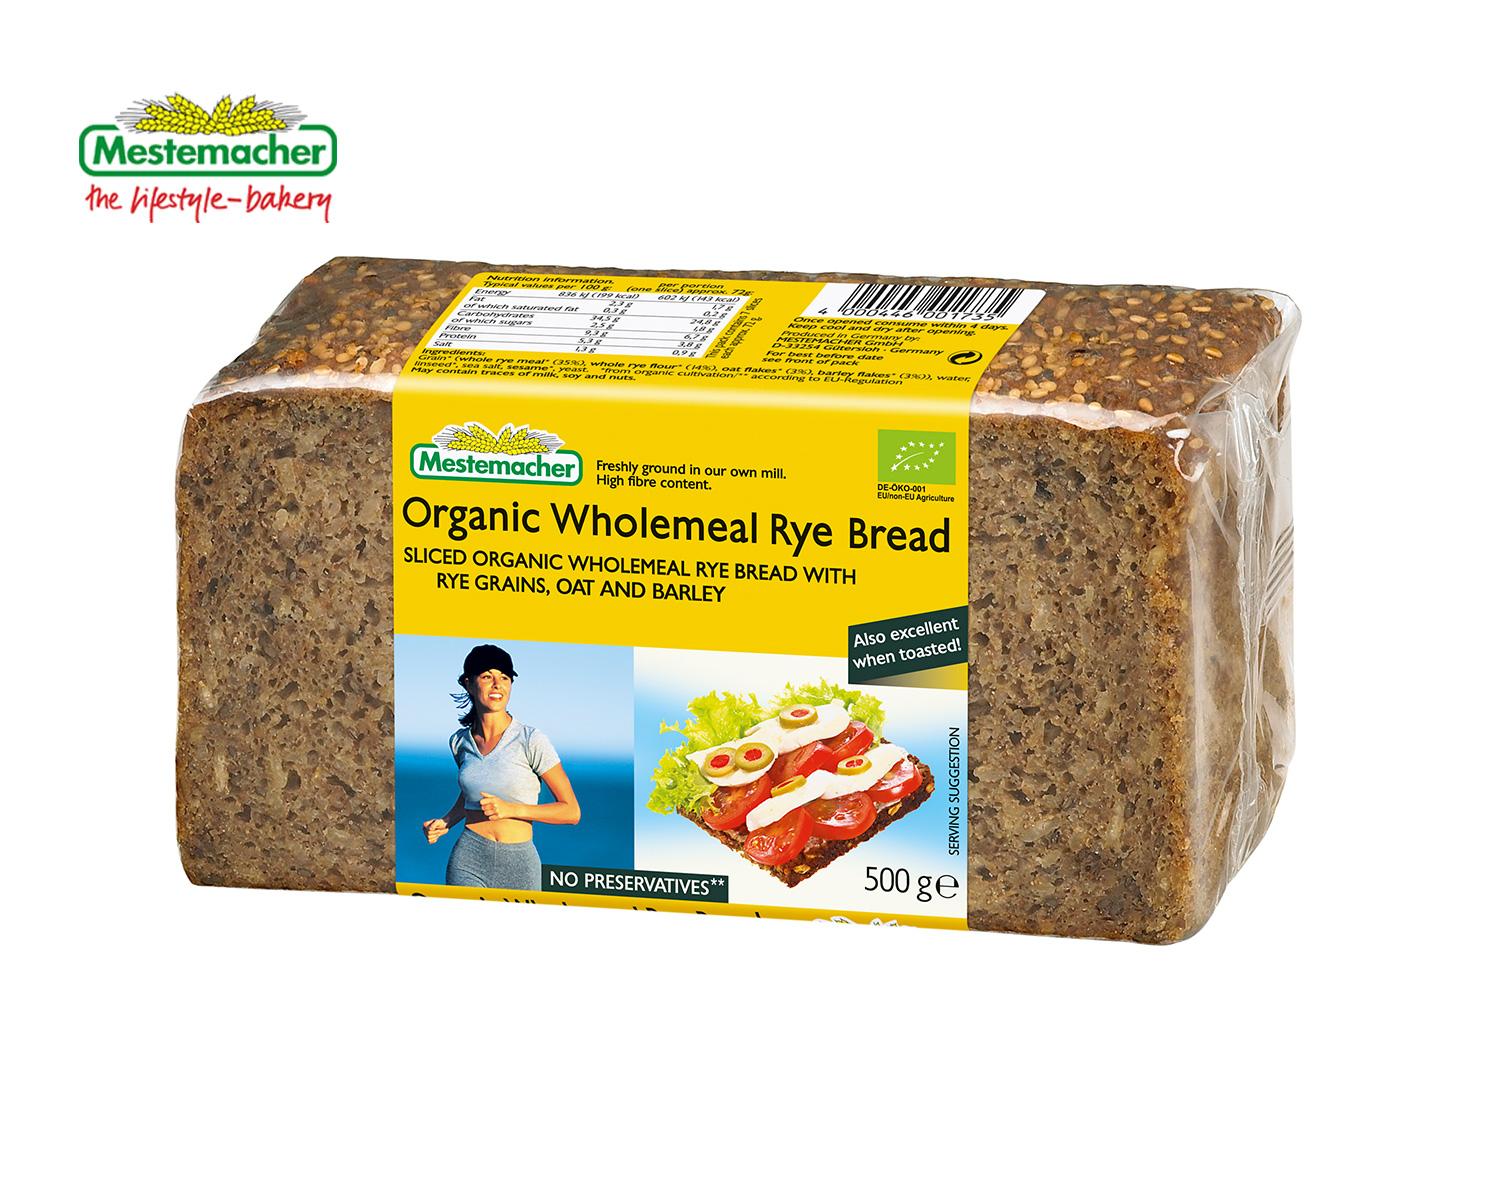 Organic Wholemeal Rye Bread